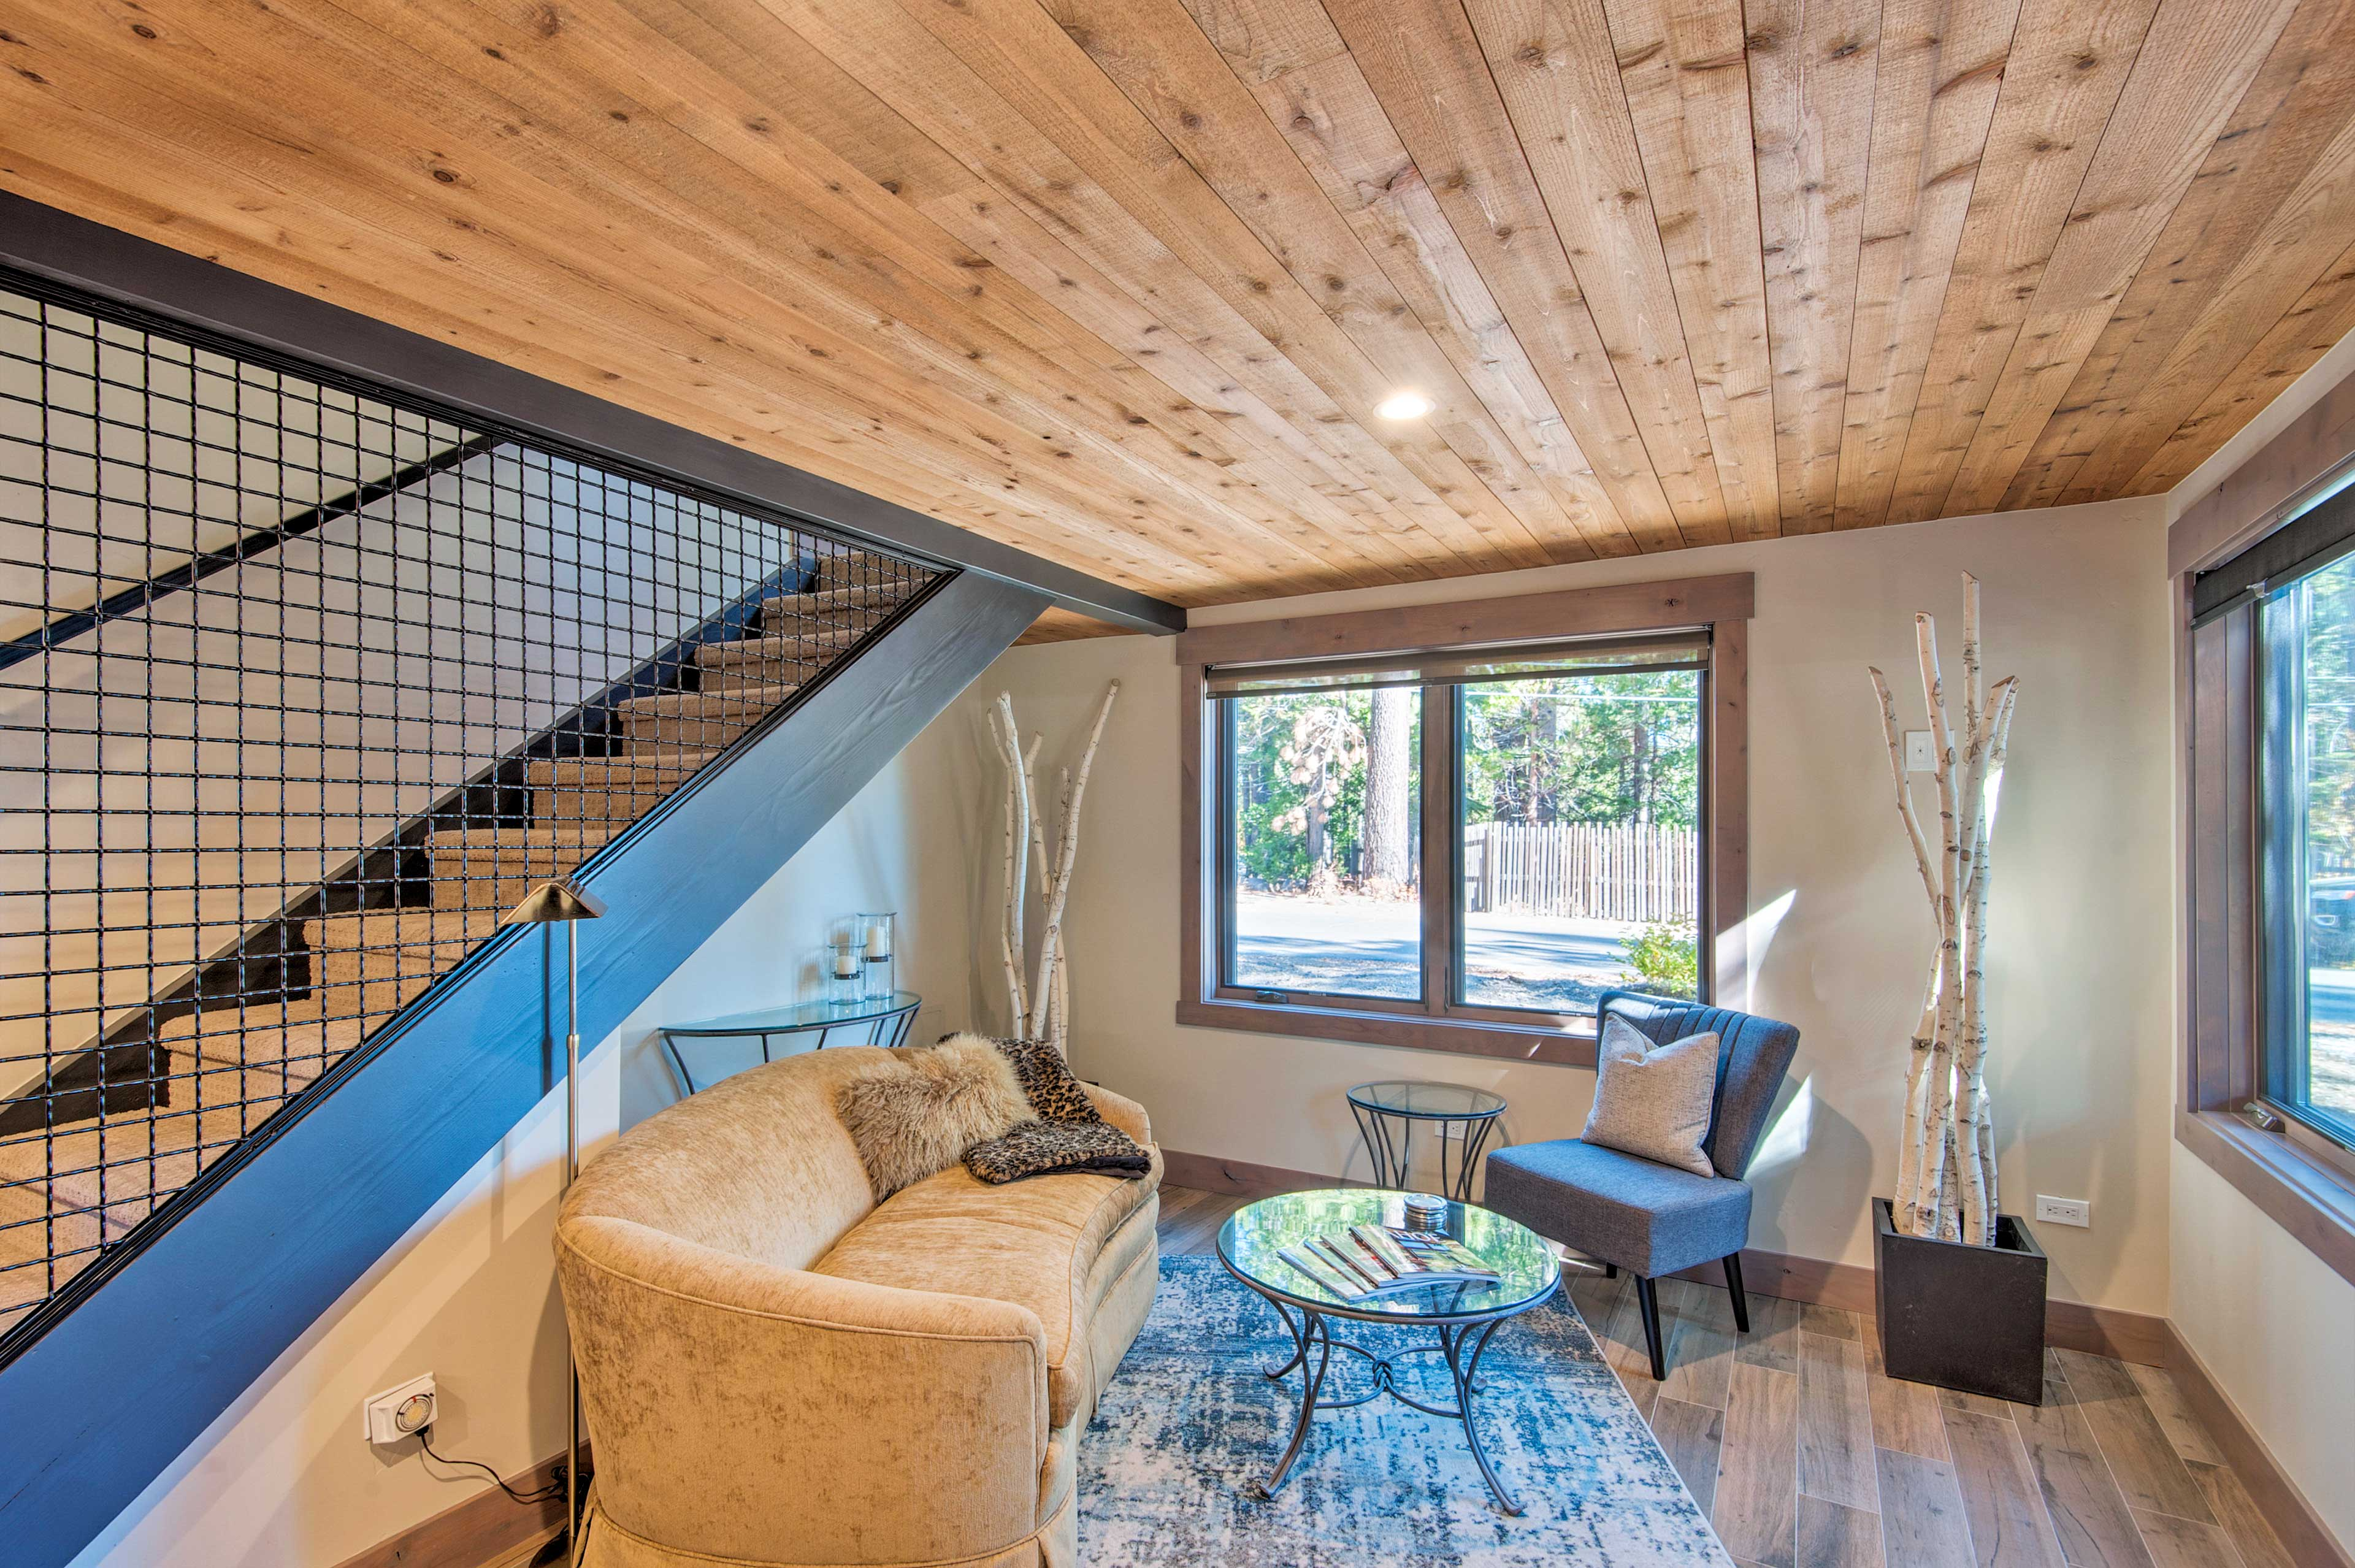 Inside, a newly renovated living space awaits.